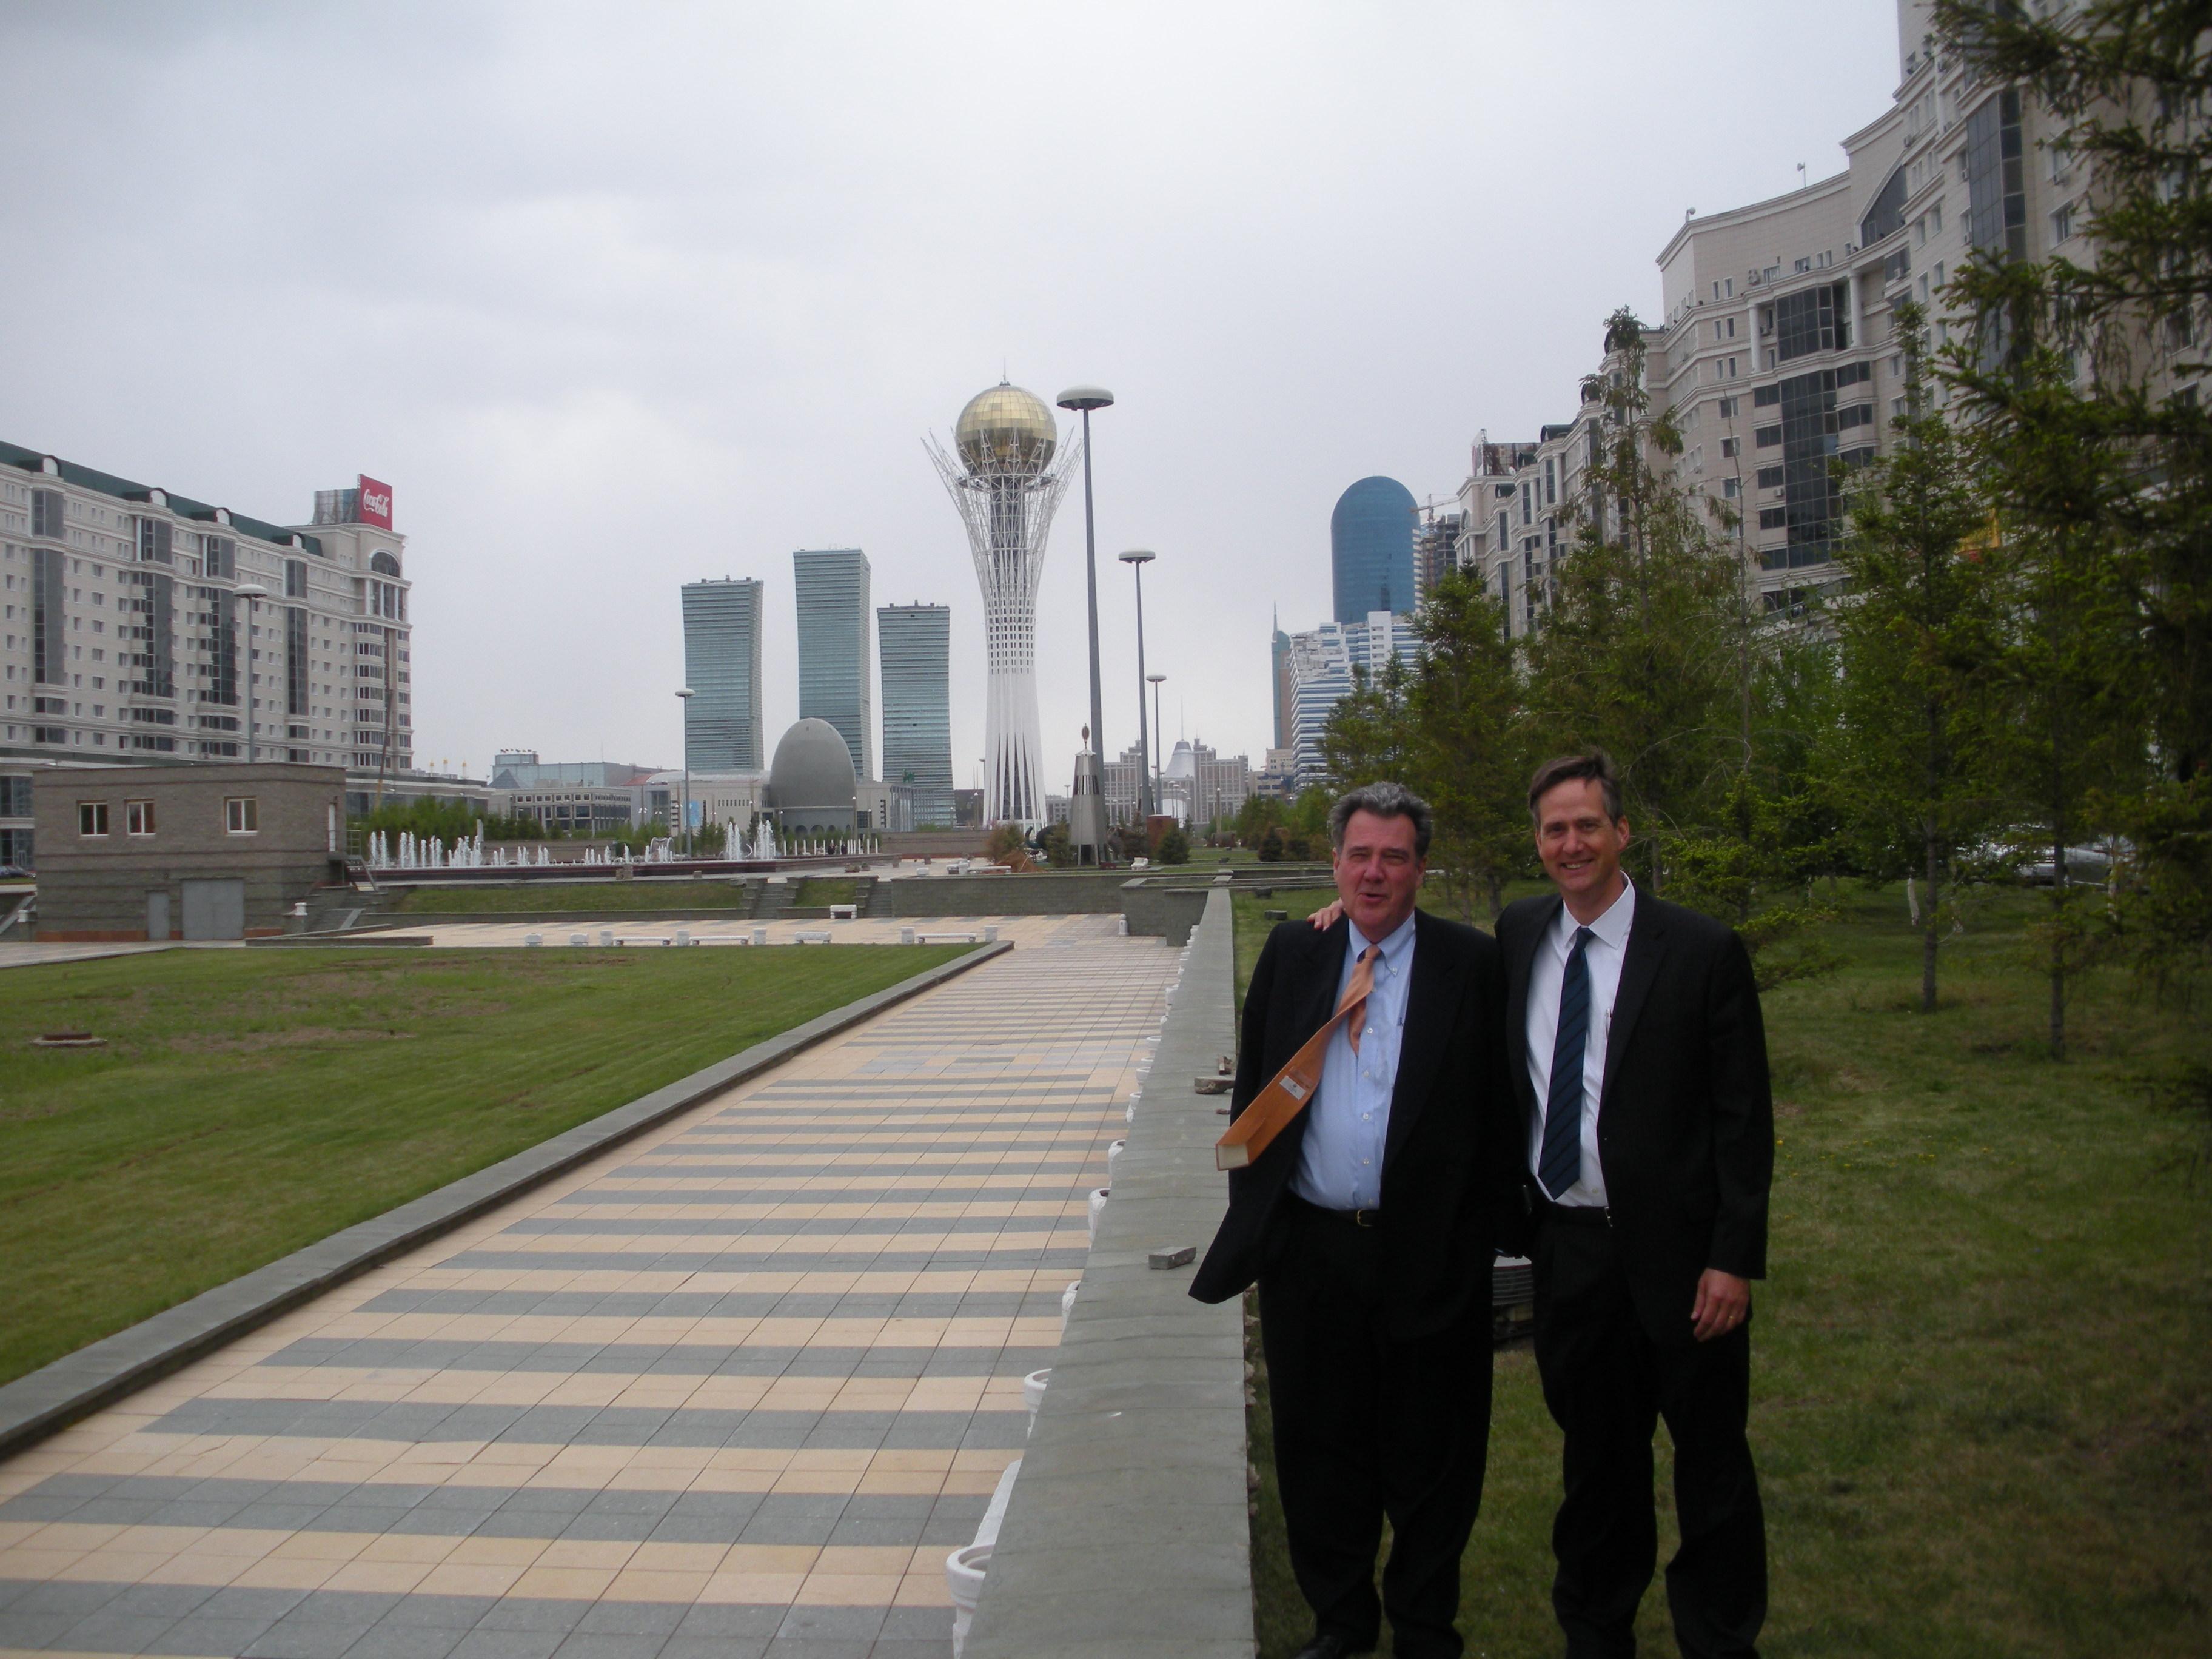 Professors Alan Ruby and Matt Hartley in Kazakhstan.